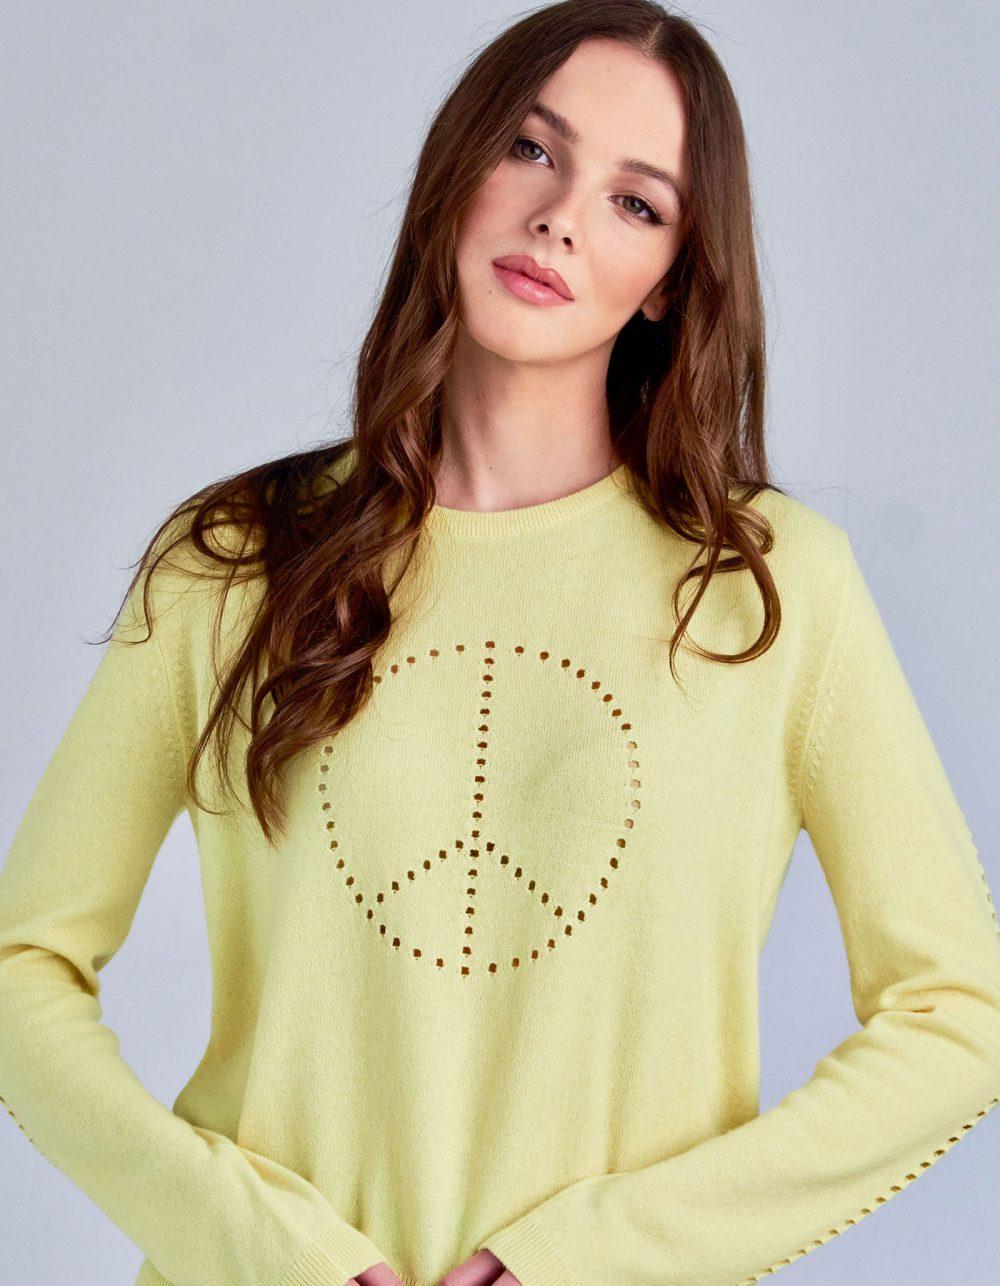 A studio shot of a model in designer cashmere knitwear, the malin darlin Peace cashmere jumper.